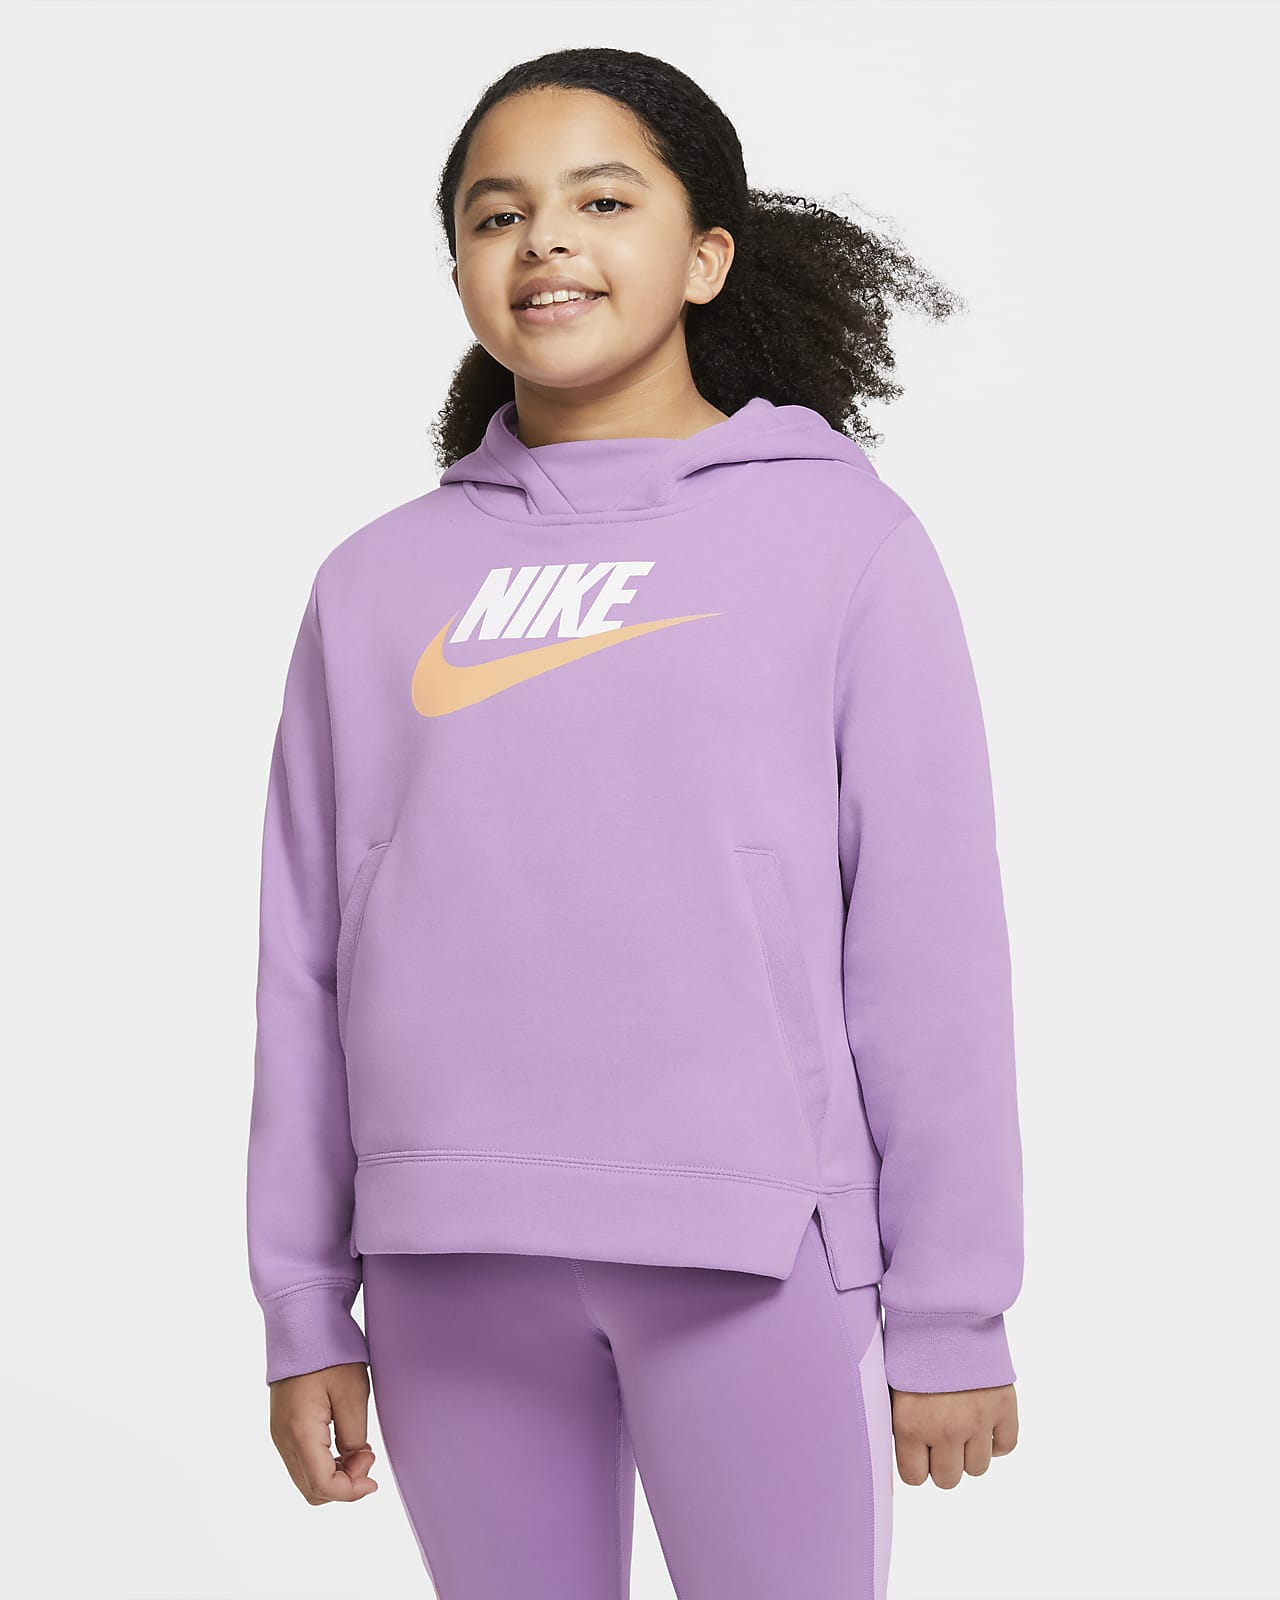 Nike Sportswear Older Kids' (Girls') Pullover Hoodie (Extended Size)